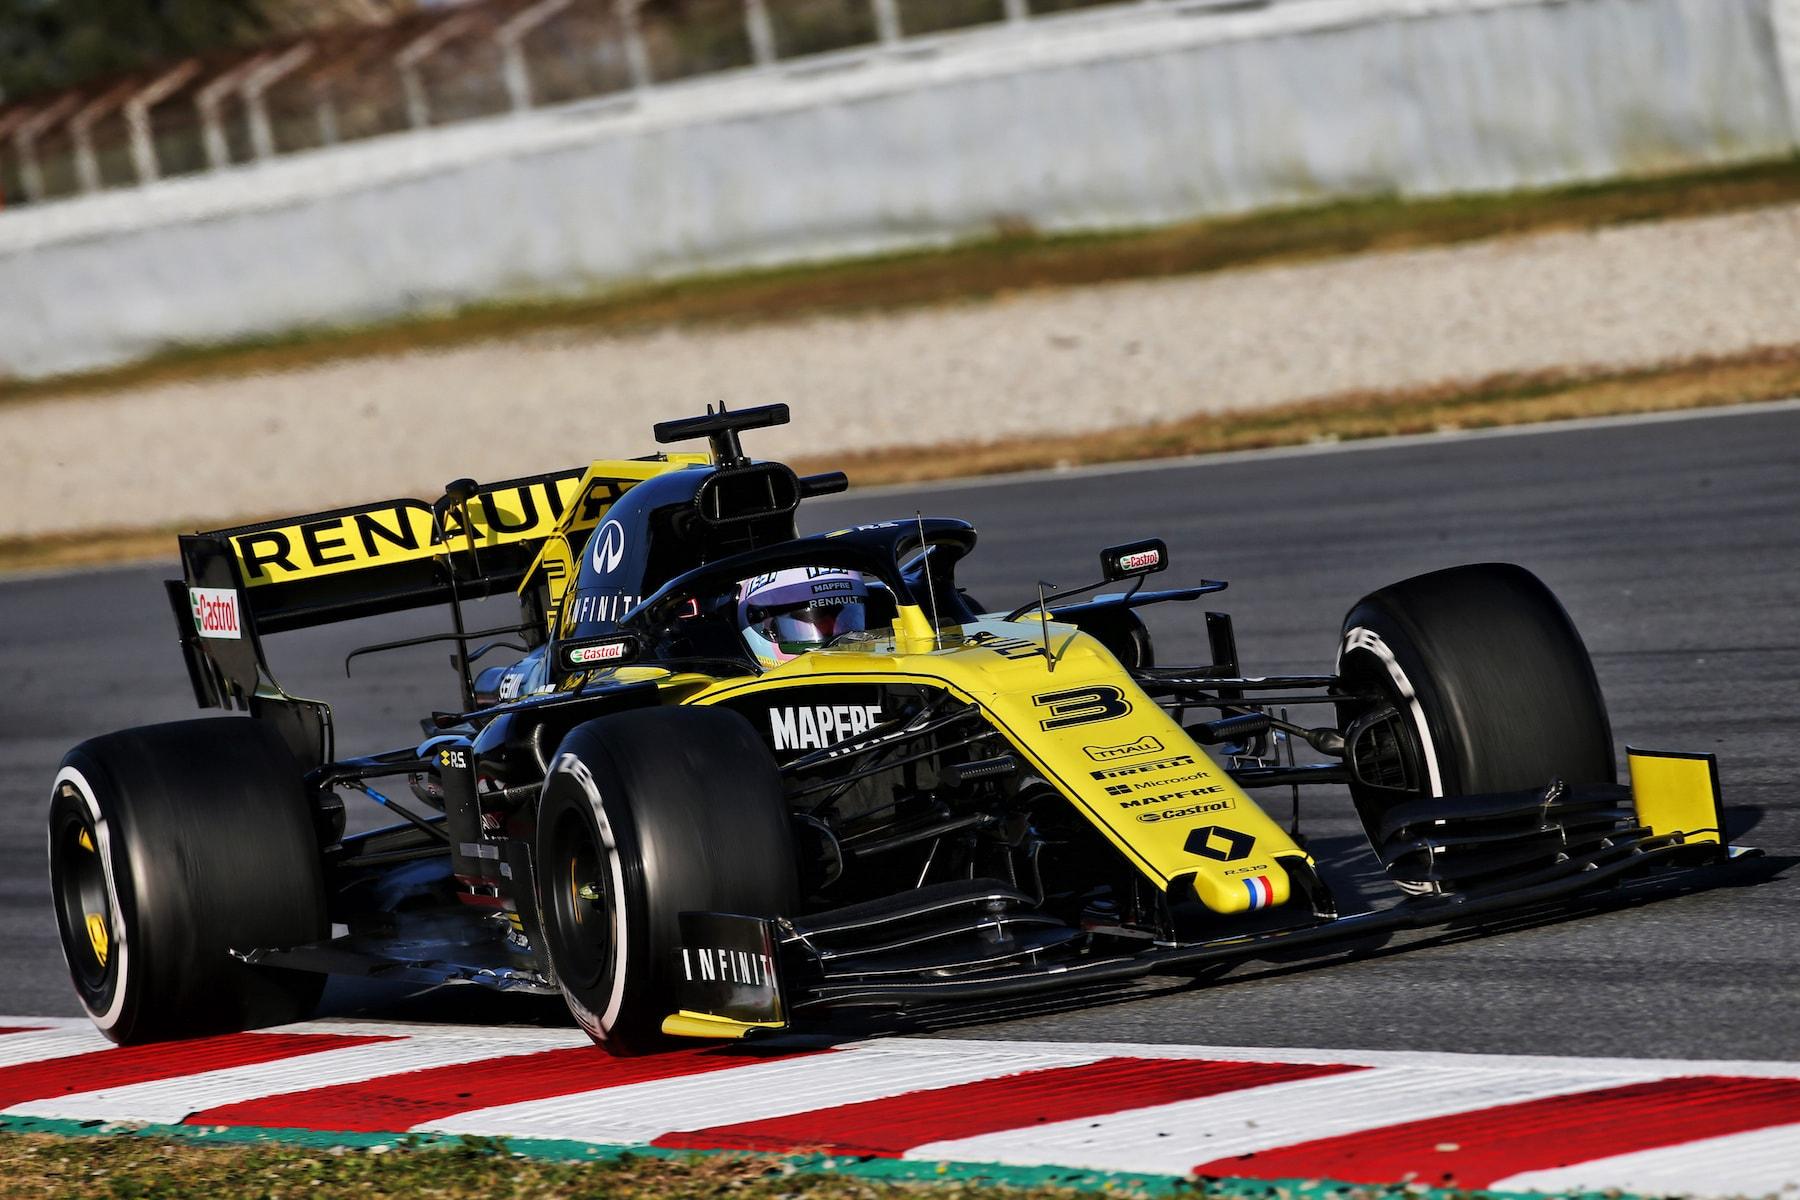 2019 Daniel Ricciardo   Renault RS19   2019 Barcelona T1 D1 1 copy.jpg